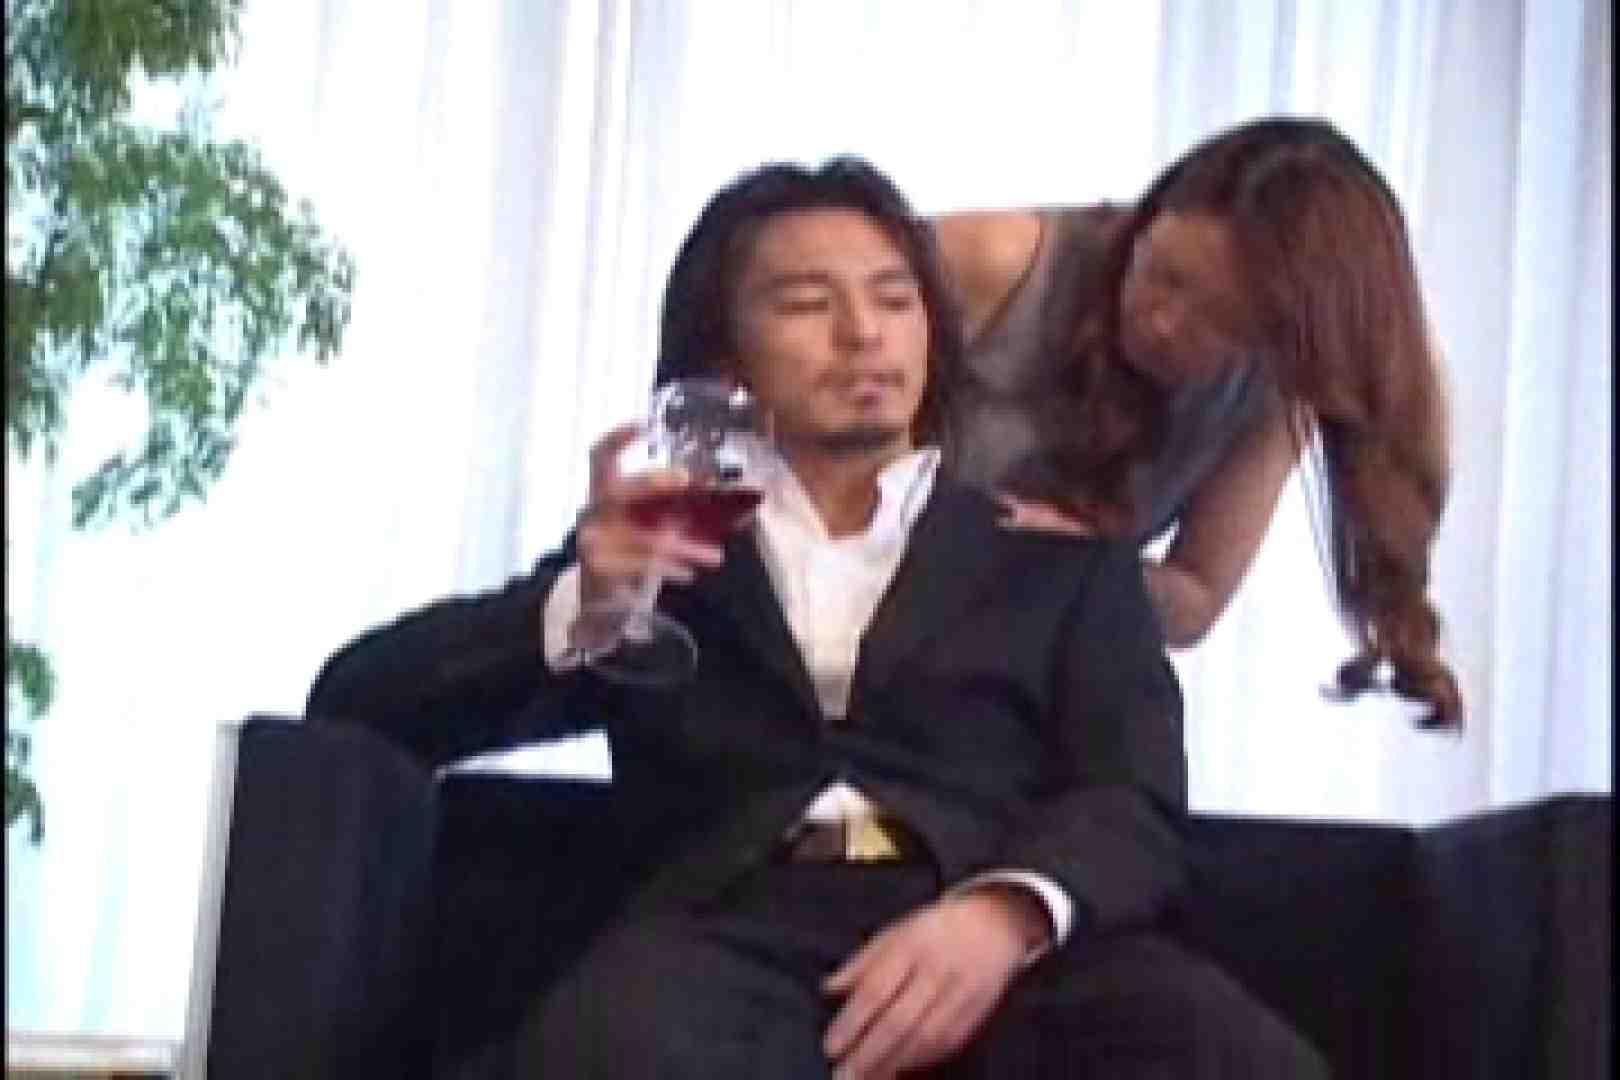 BEST OF イケメン!!男目線のガチSEX vol.06(対女性作品) ディープキス | 対女性 チンコ画像 72pic 1